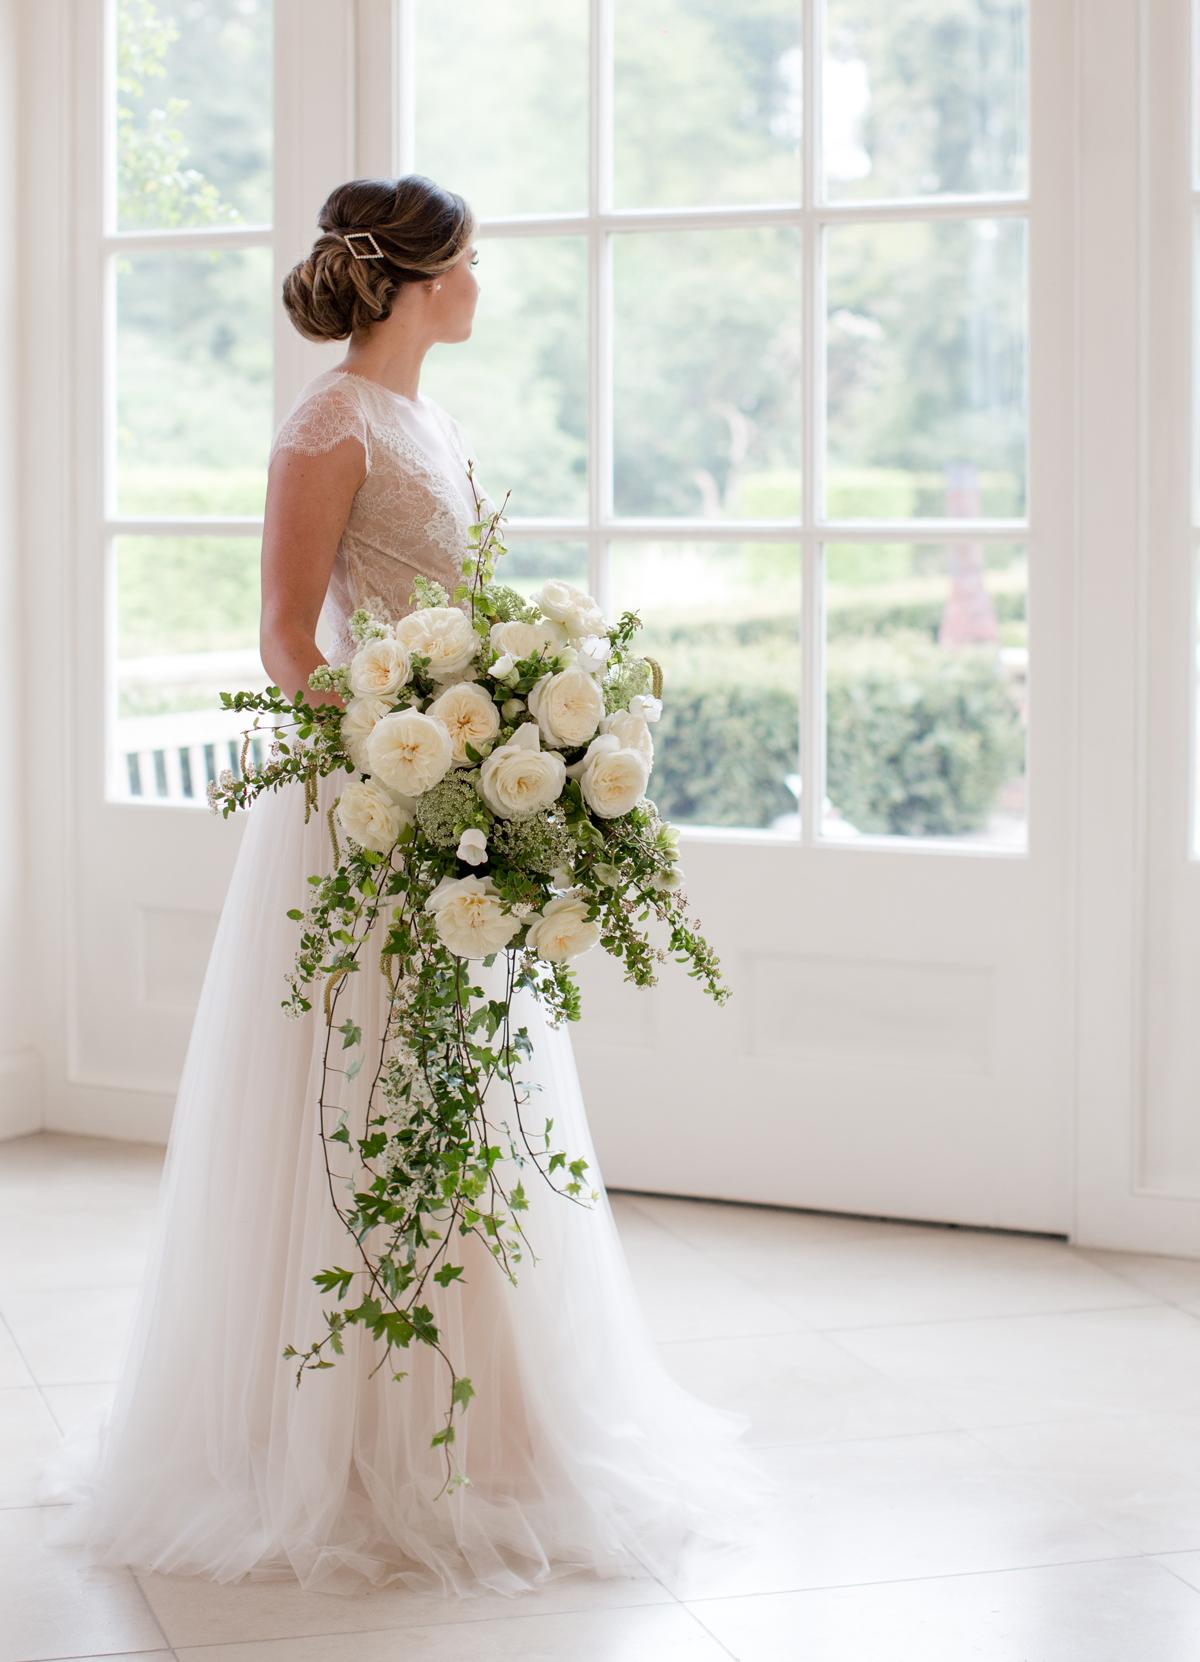 David Austin Leonora wedding bouquet